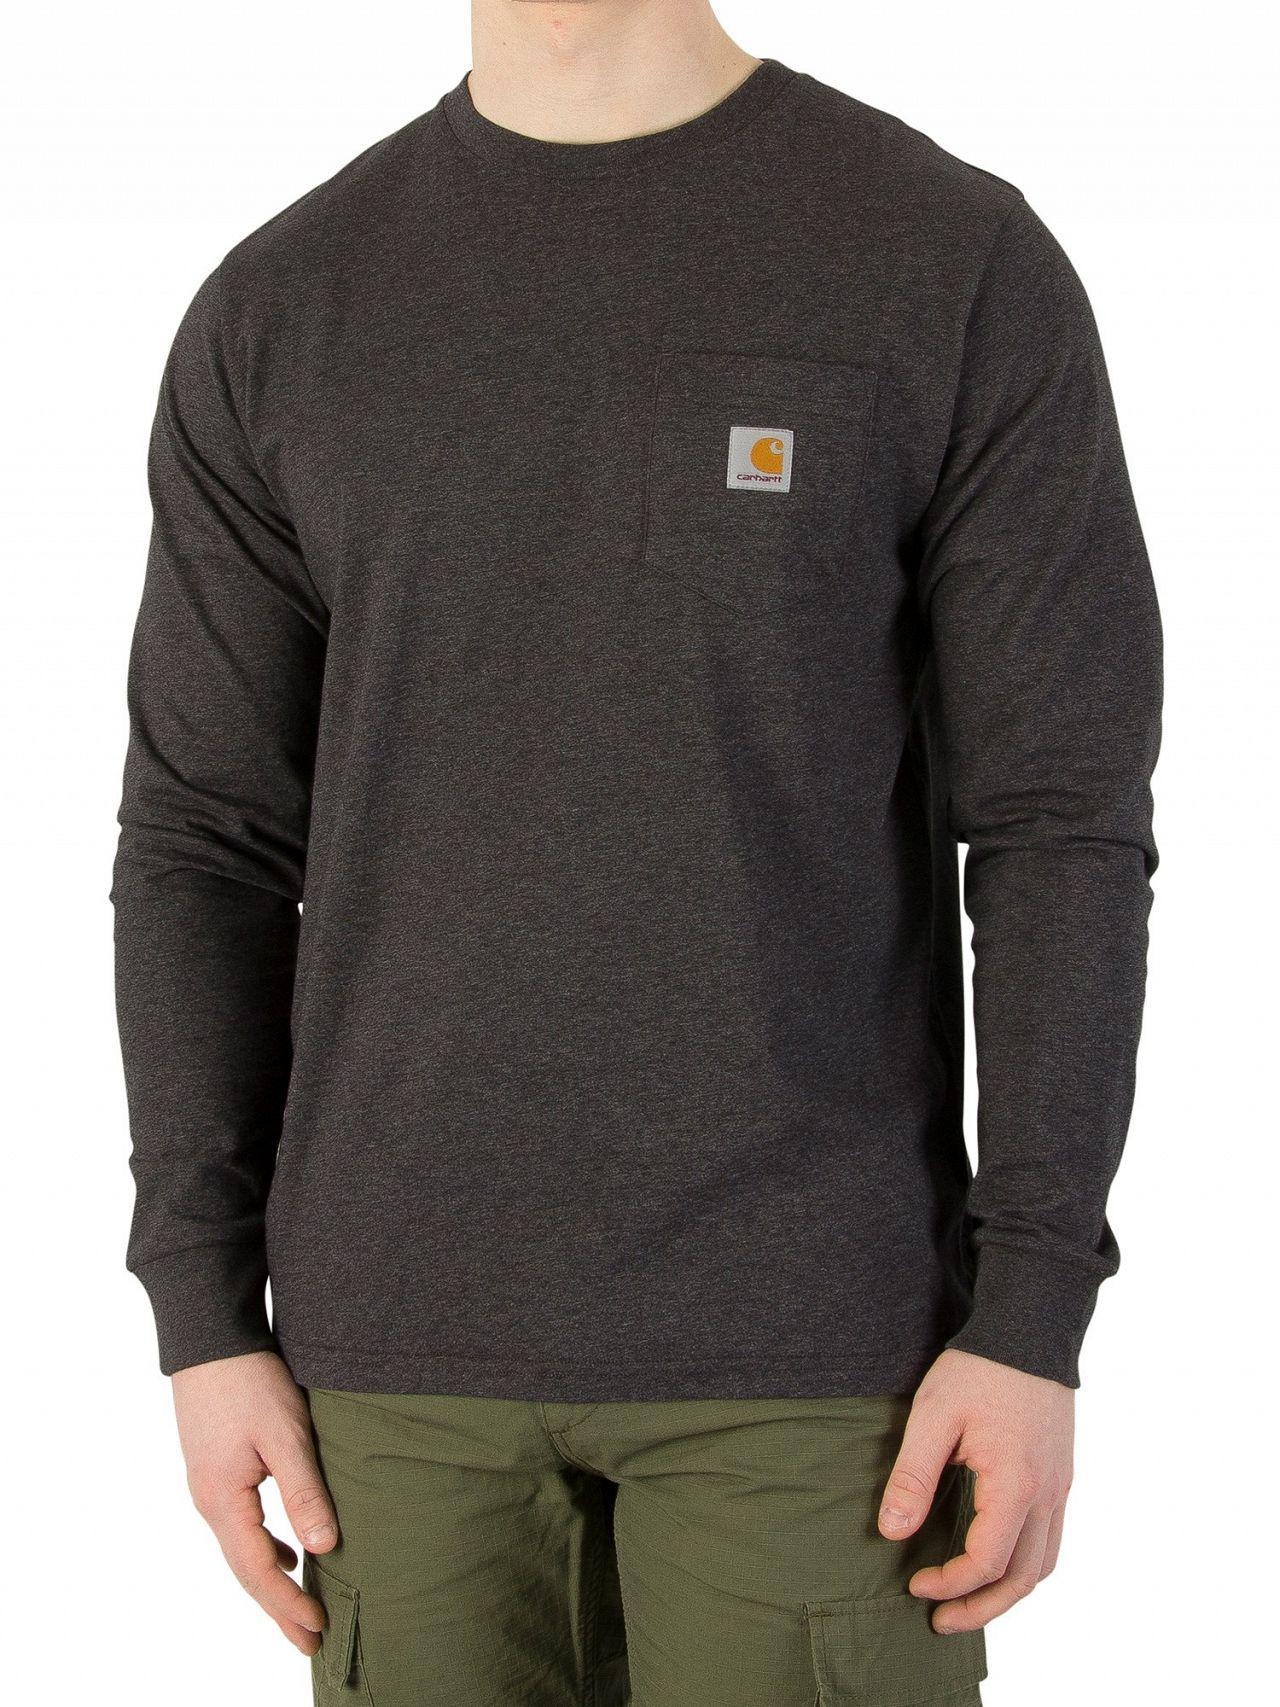 c8041159c Carhartt WIP. Men's Black Heather Longsleeved Marled Pocket Logo T-shirt